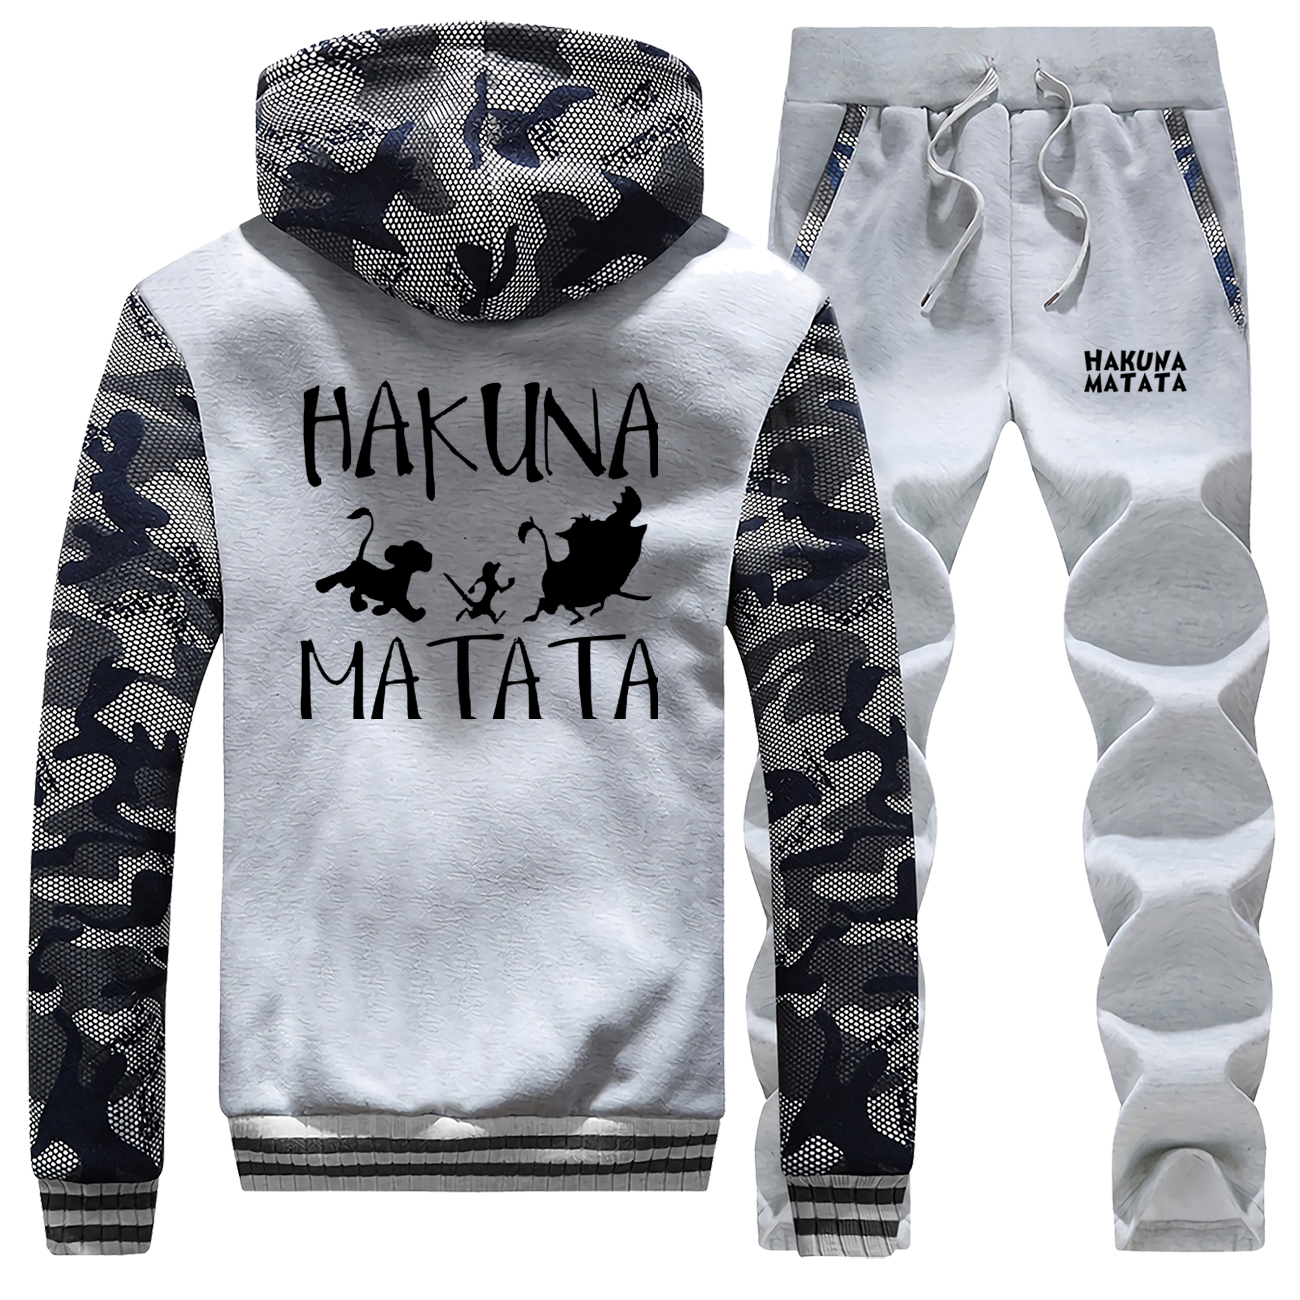 The Lion King Winter Warm Suit Hoodies+Pants 2 Piece Sets HAKUNA MATATA Tracksuit Cartoon Sweatshirt Men's Jacket Men Trousers